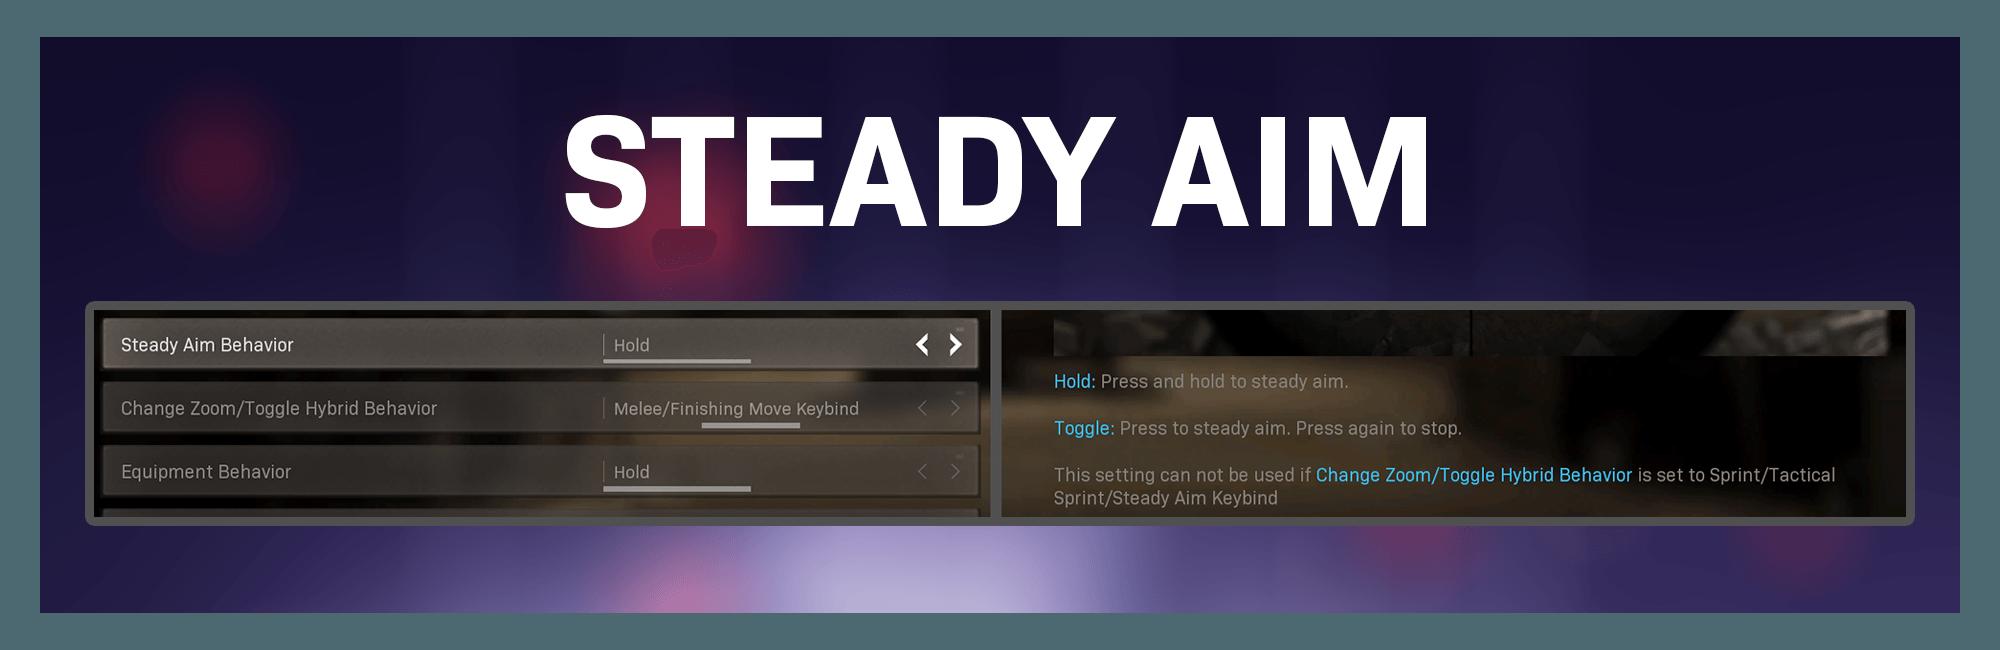 Banner showing the new Steady Aim Behavior menu option.